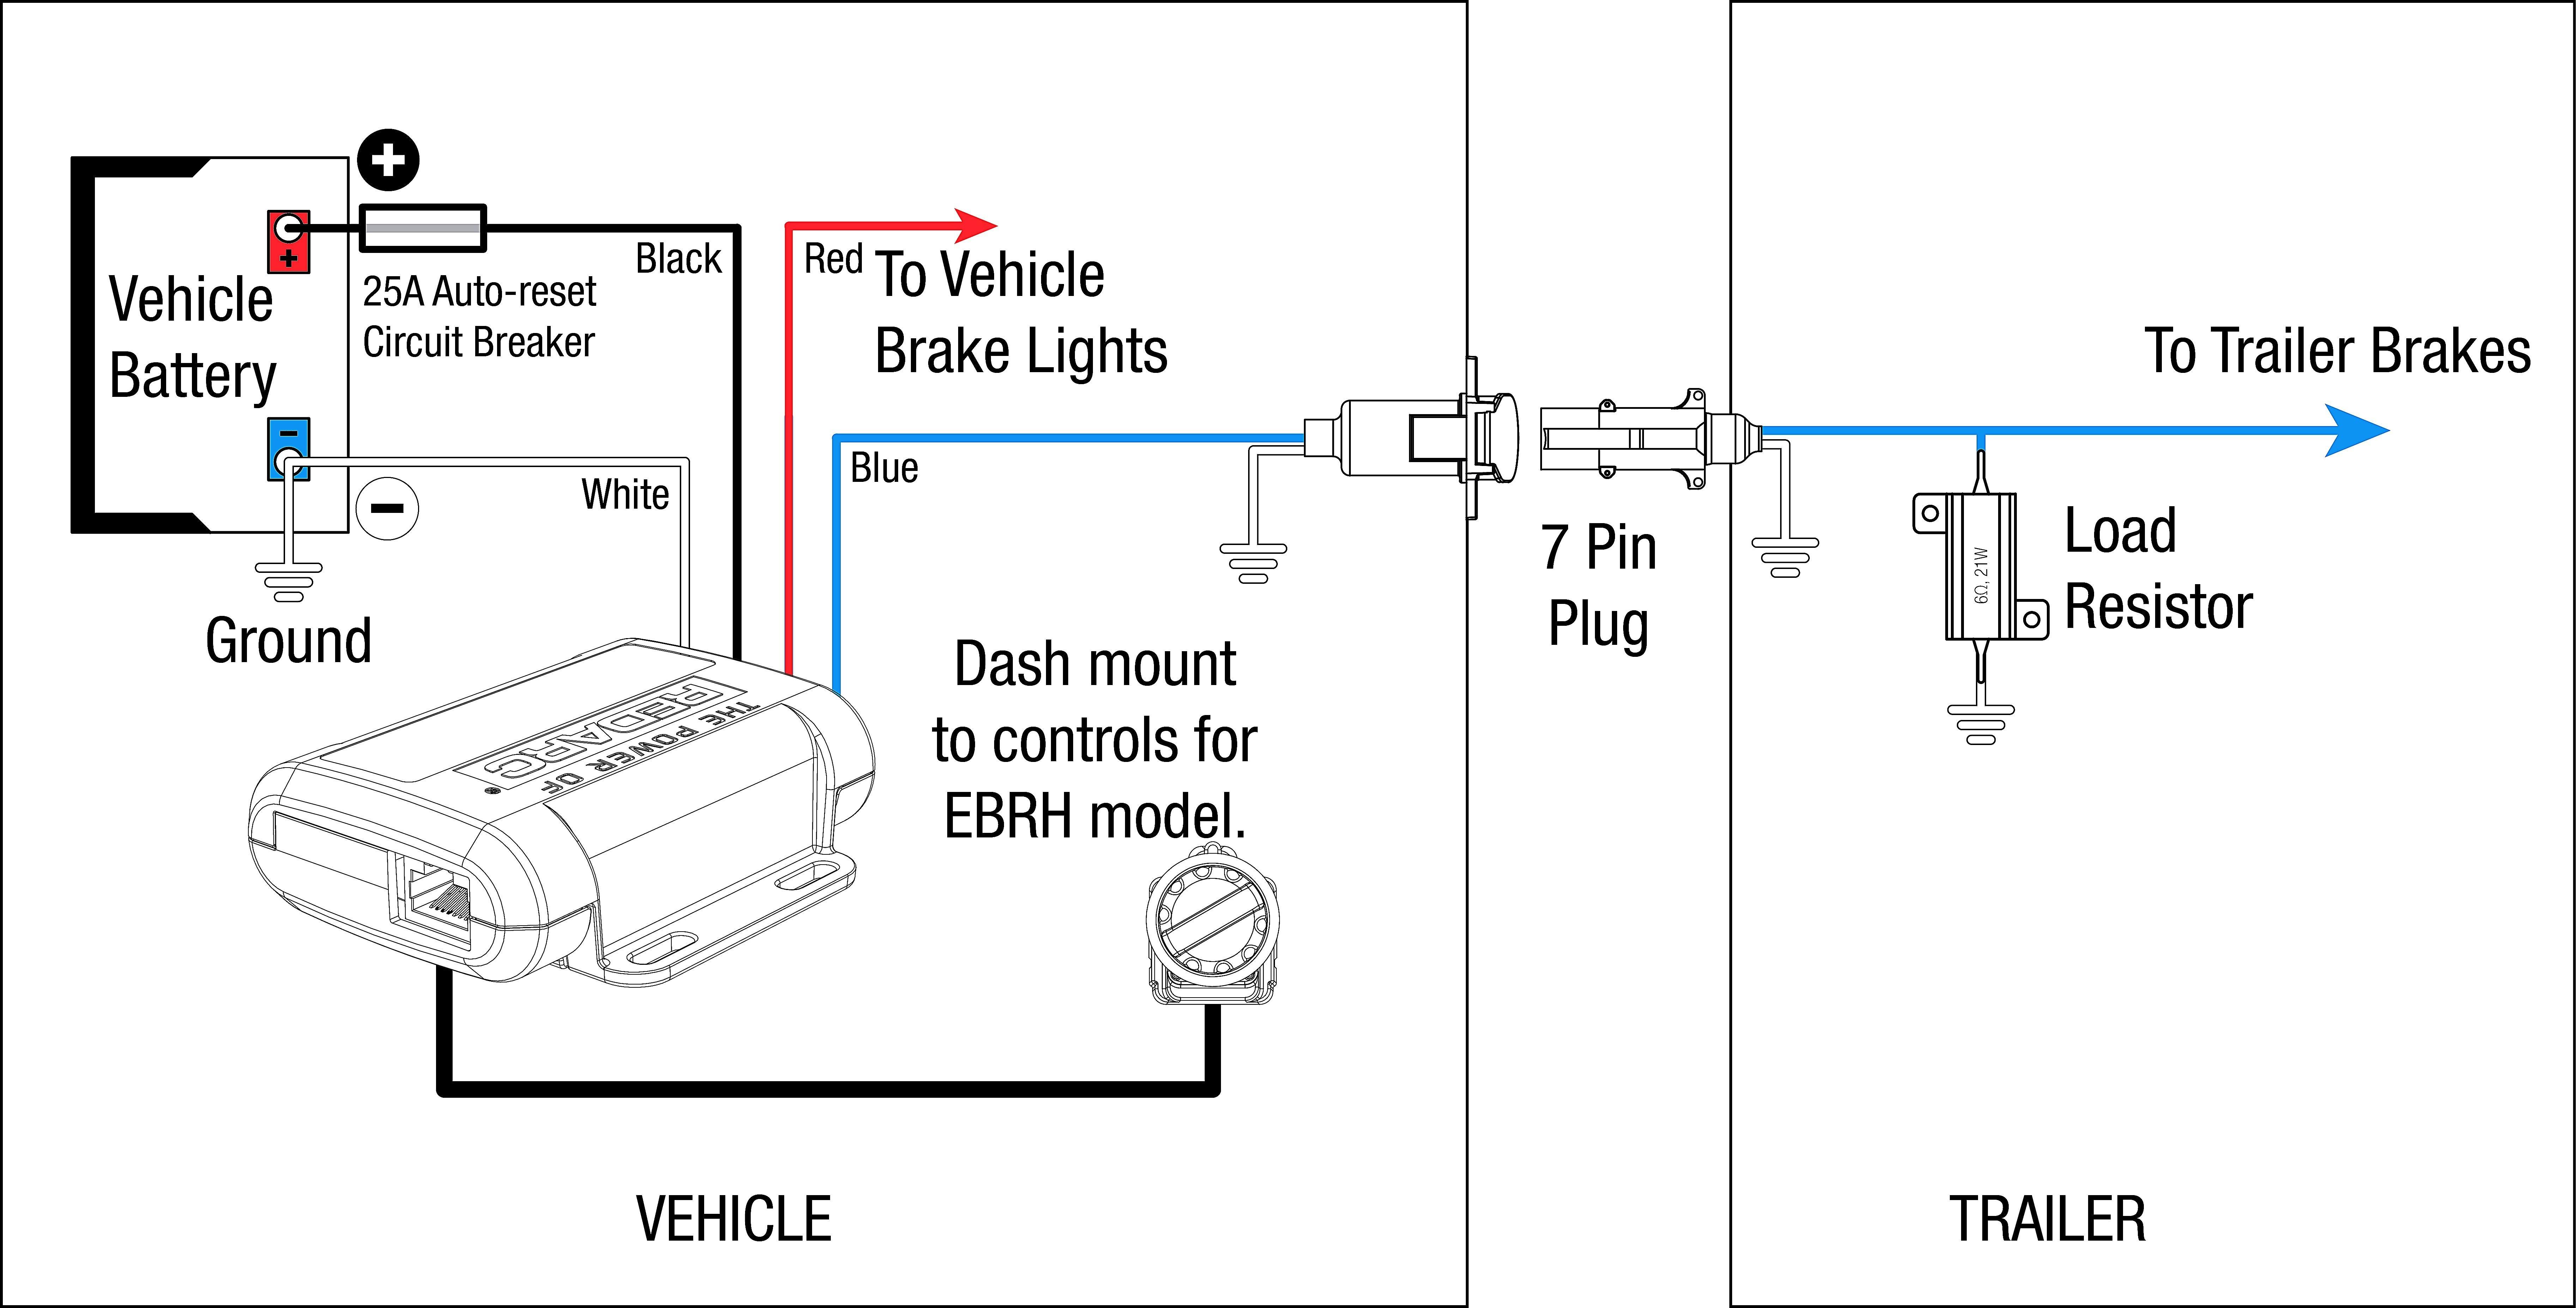 Trailer Brake Breakaway Wiring Diagram Wiring Diagram Trailer Brake Controller Fresh Break Away Systems